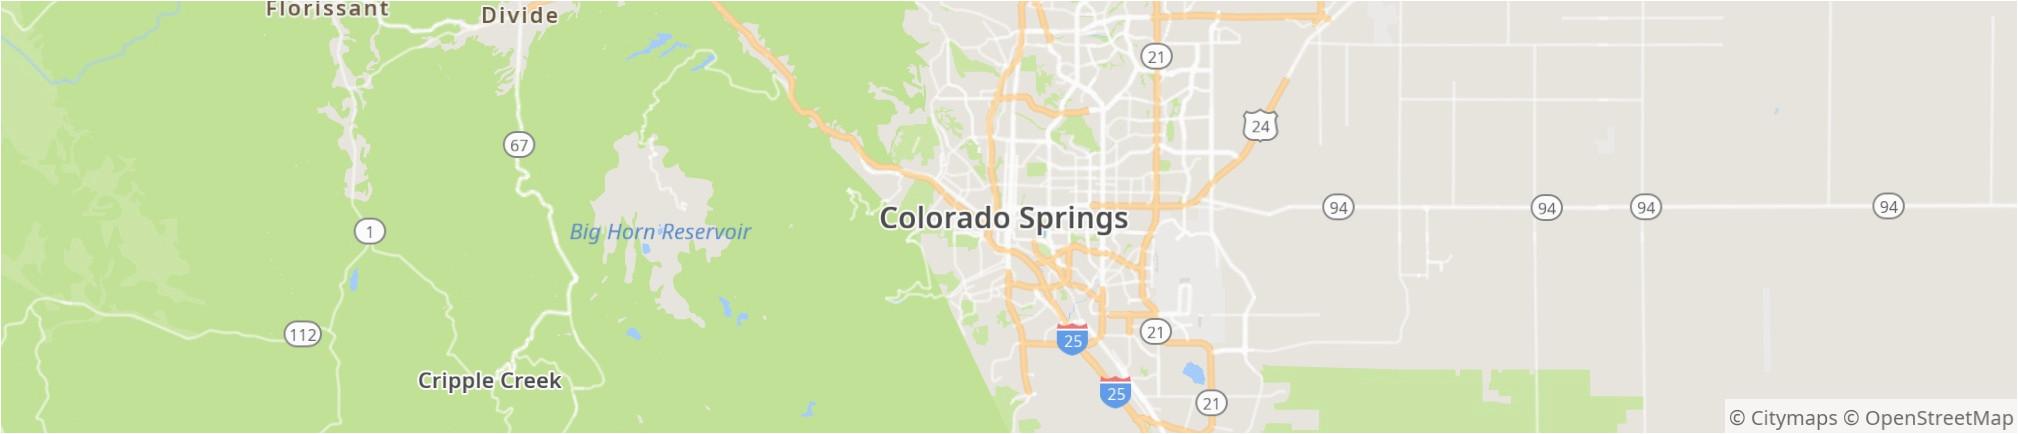 colorado springs 2019 best of colorado springs co tourism